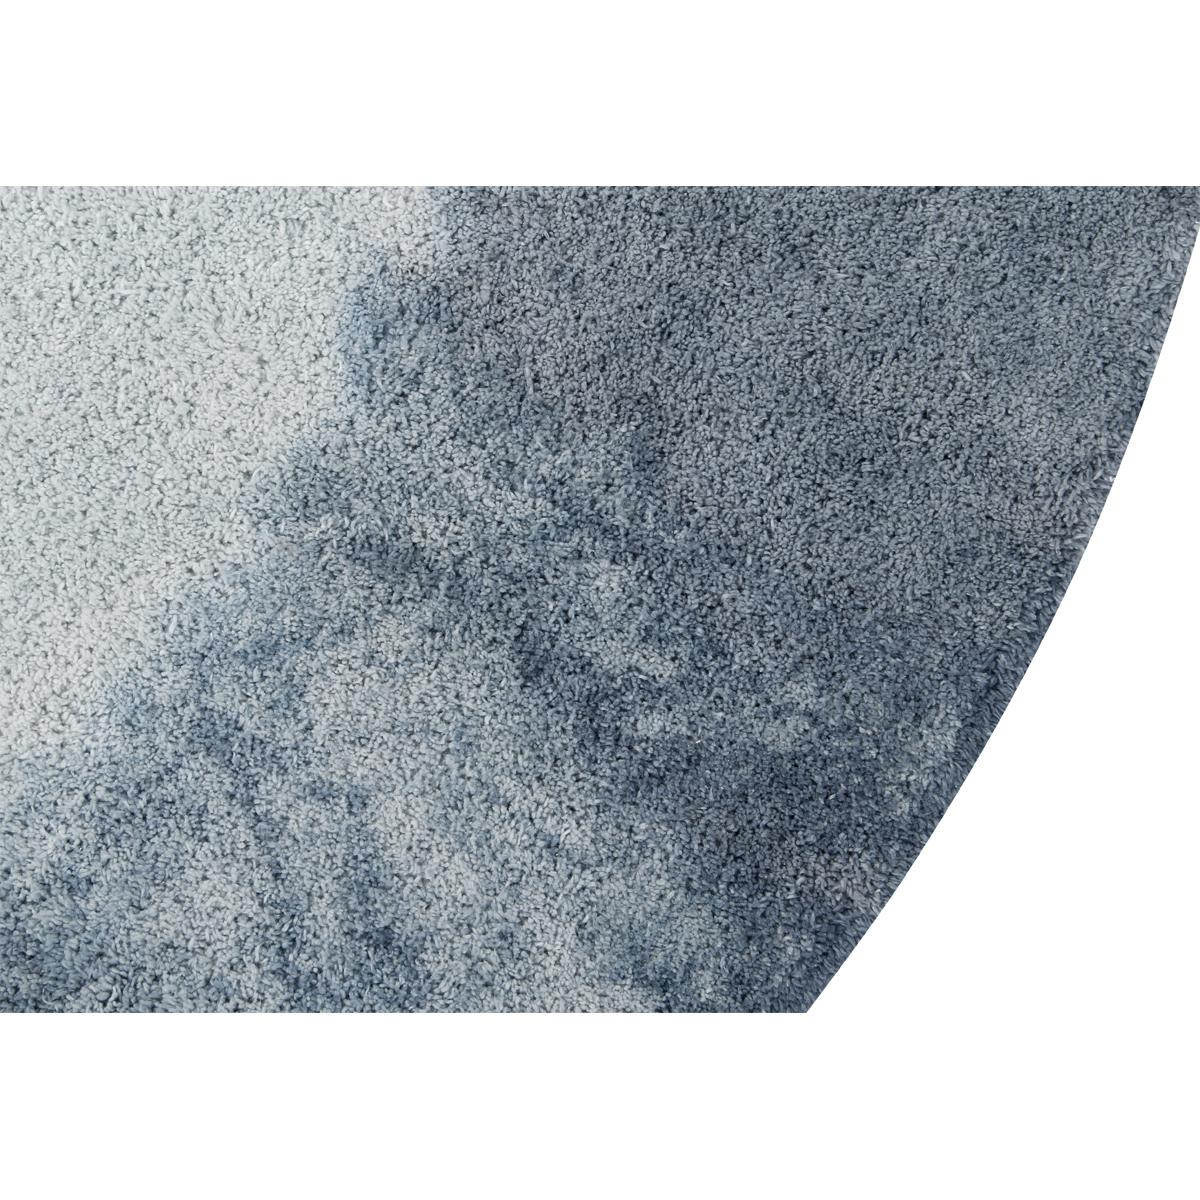 lorena canals tapis lavable tie dye 150 cm vintage. Black Bedroom Furniture Sets. Home Design Ideas